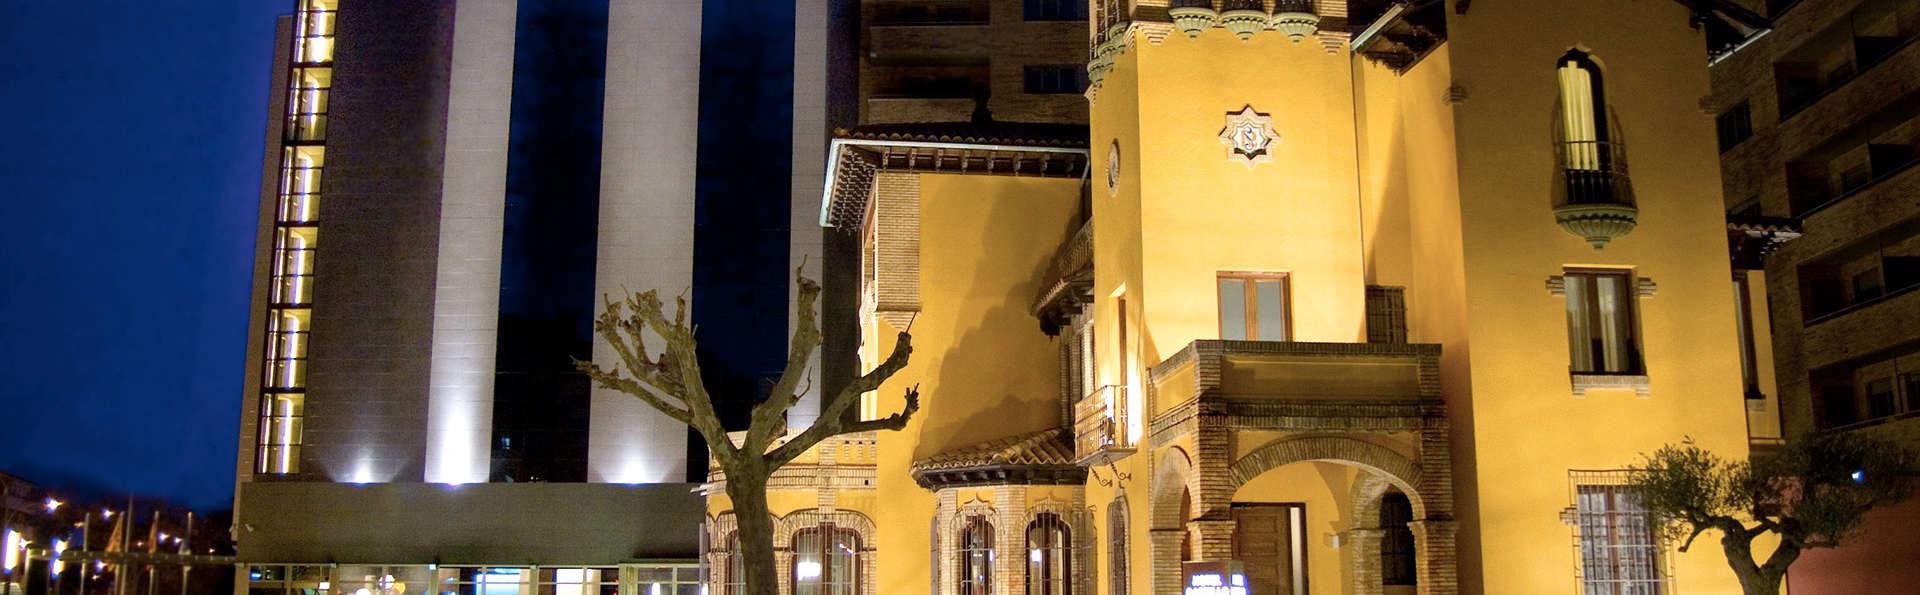 Hotel castillo de ayud 3 calatayud espa a - Castillo de ayud calatayud ...